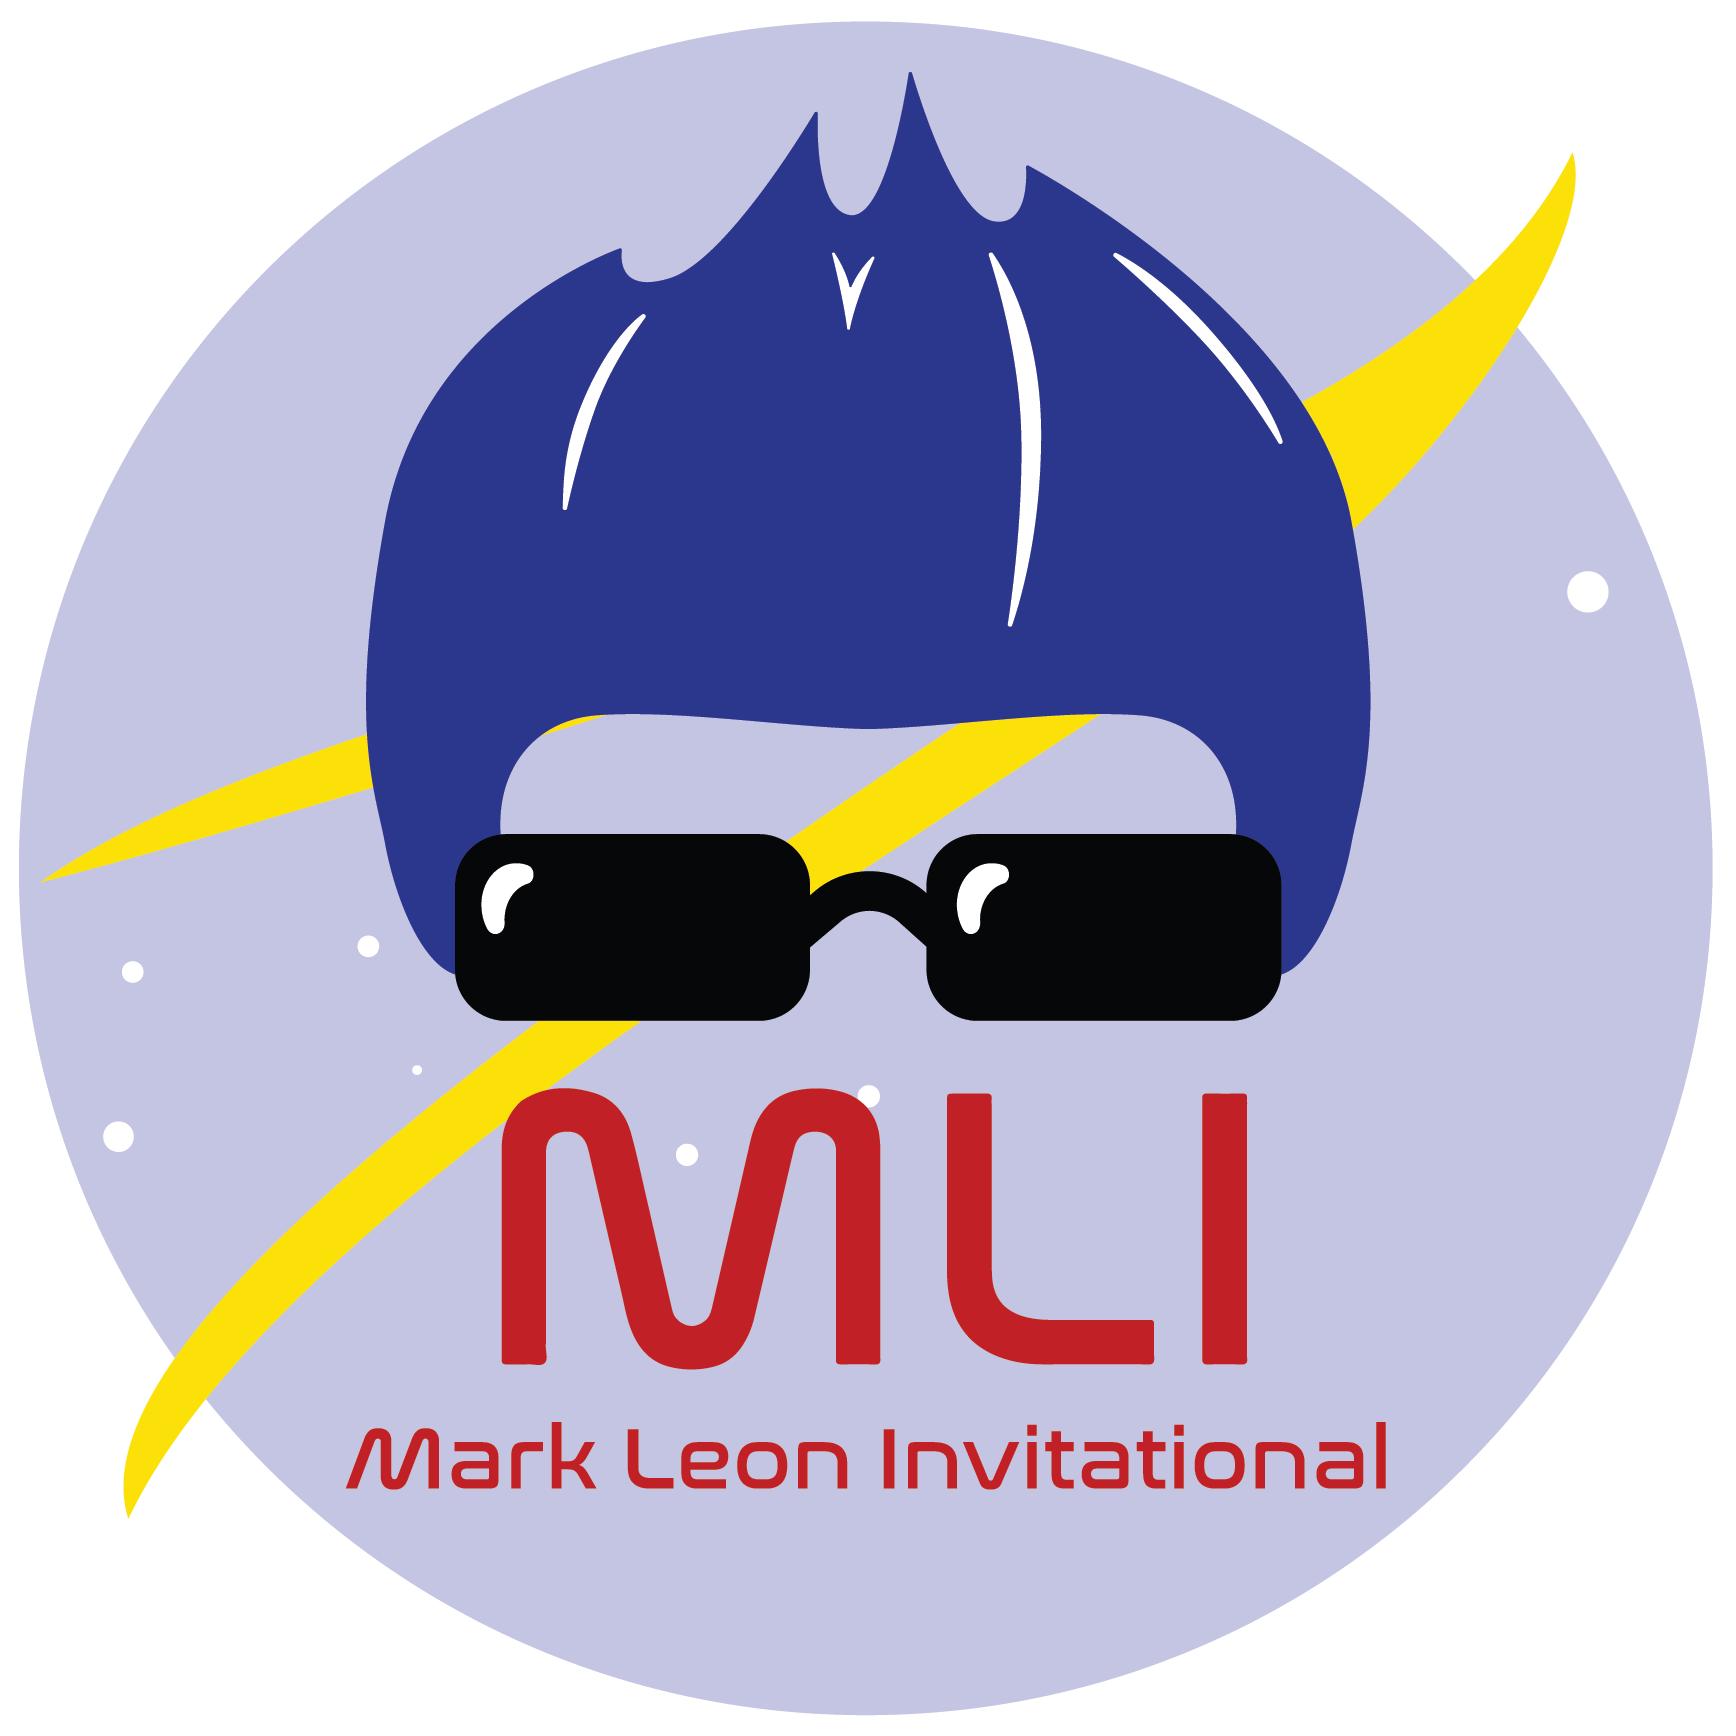 2019 VEX IQ Signature Event: Mark Leon Invitational